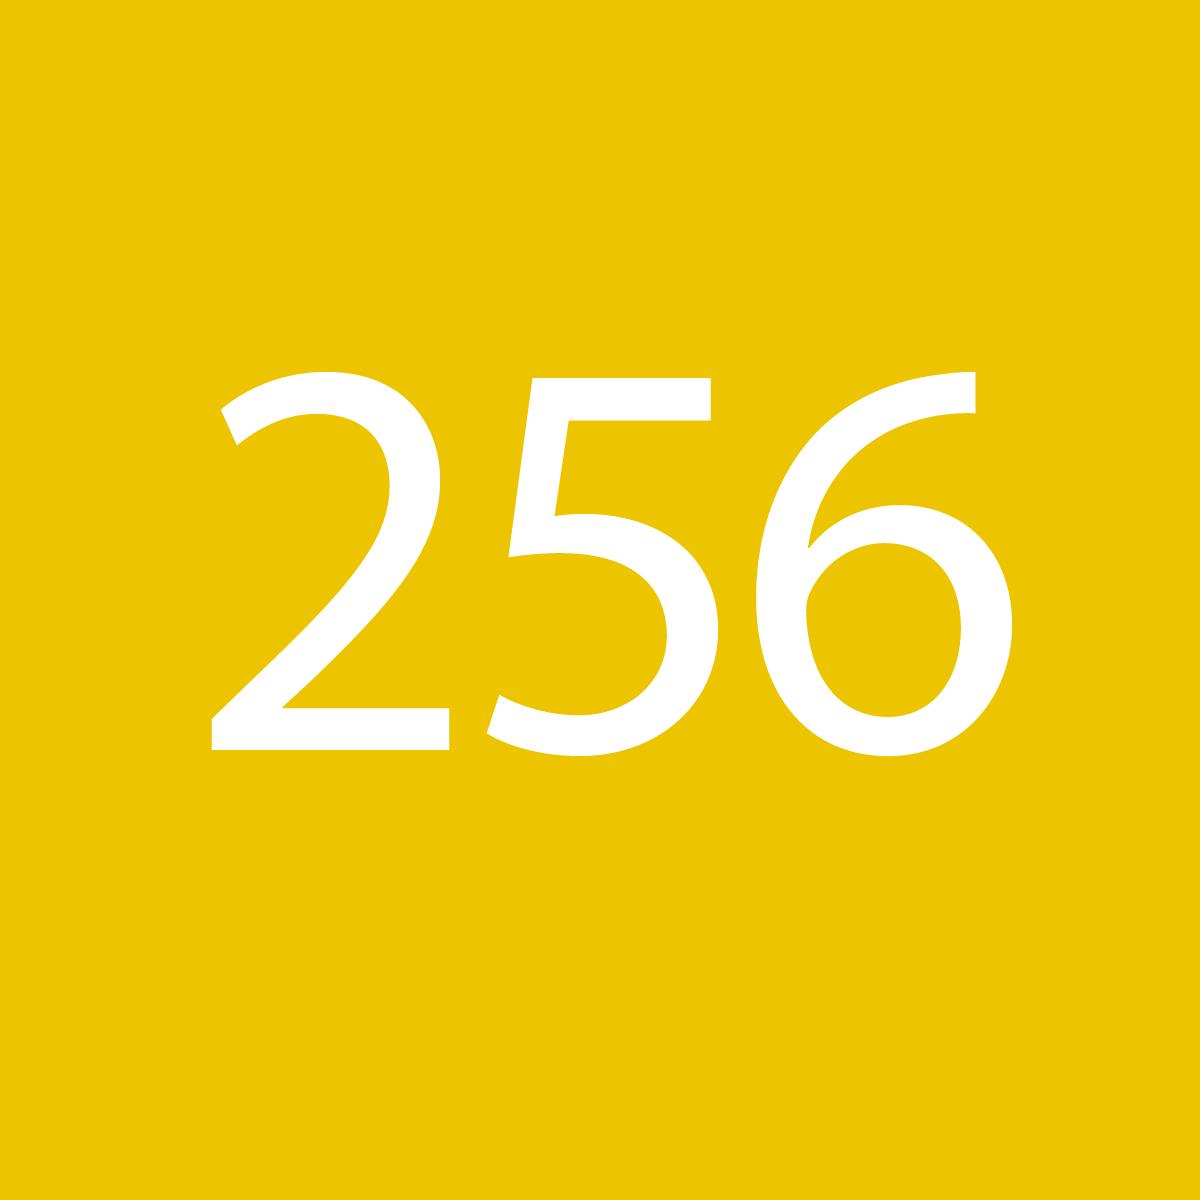 256*256